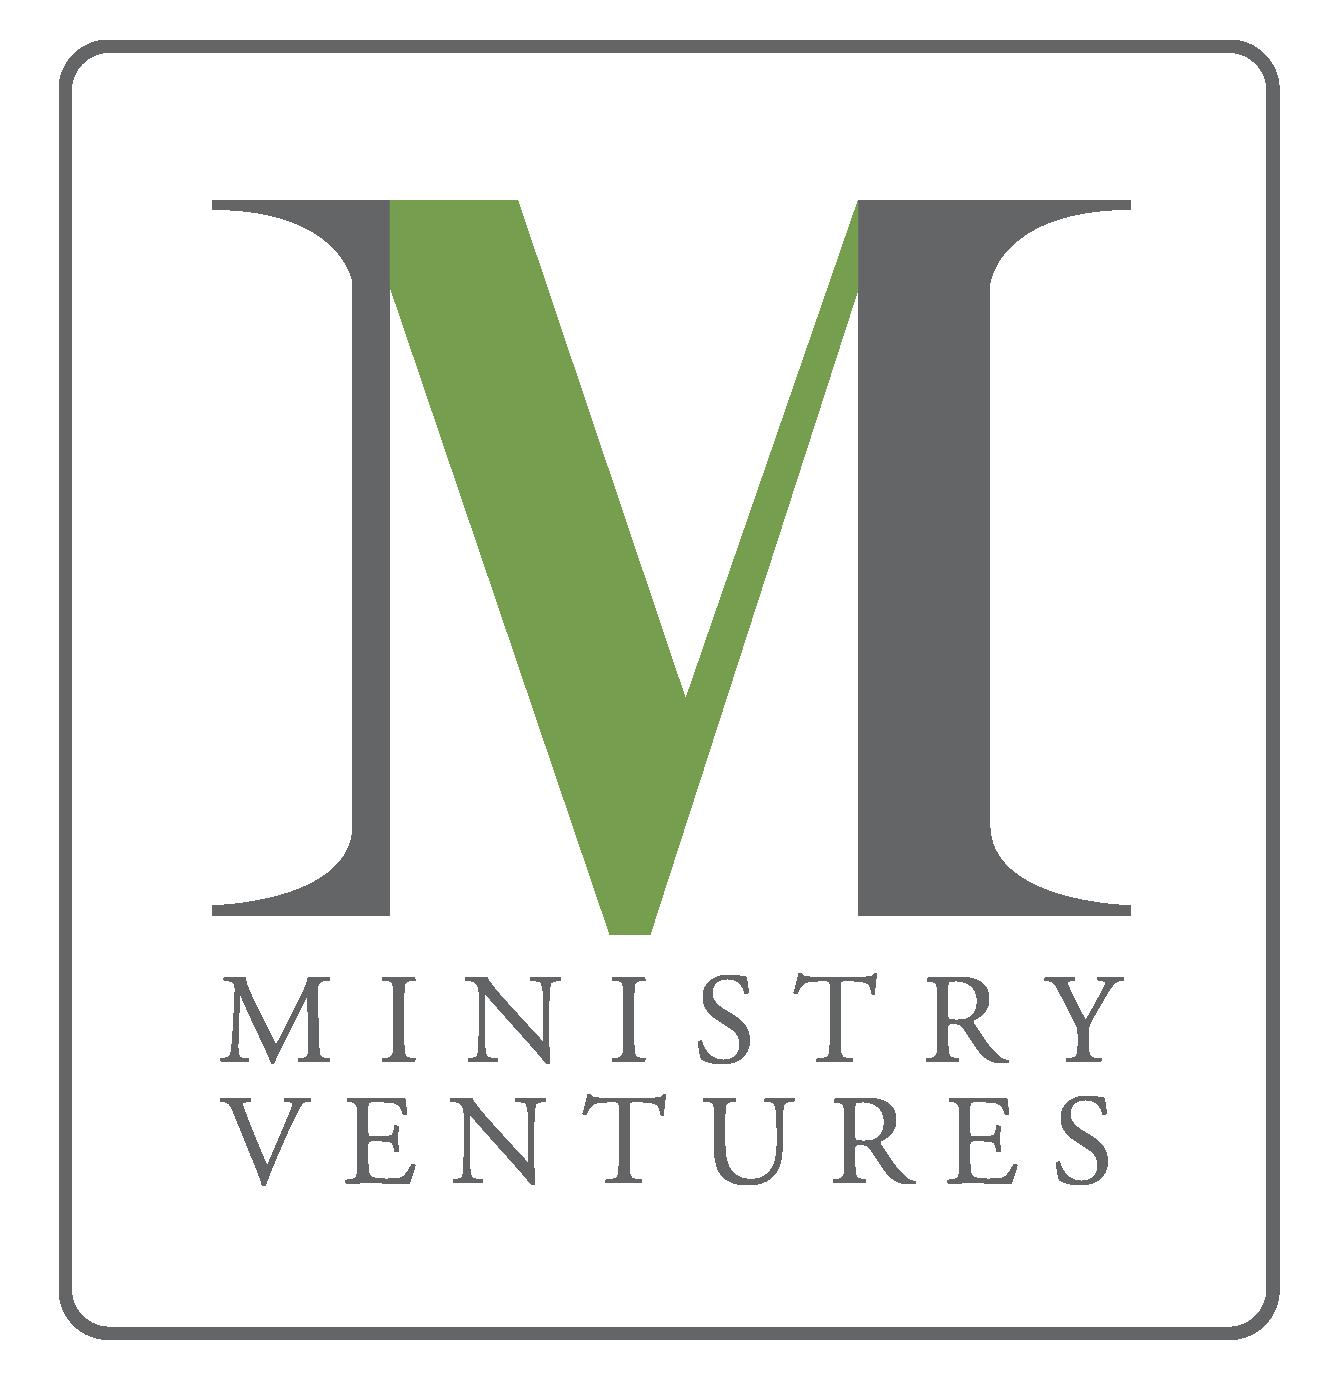 mv_traditional_logo-01